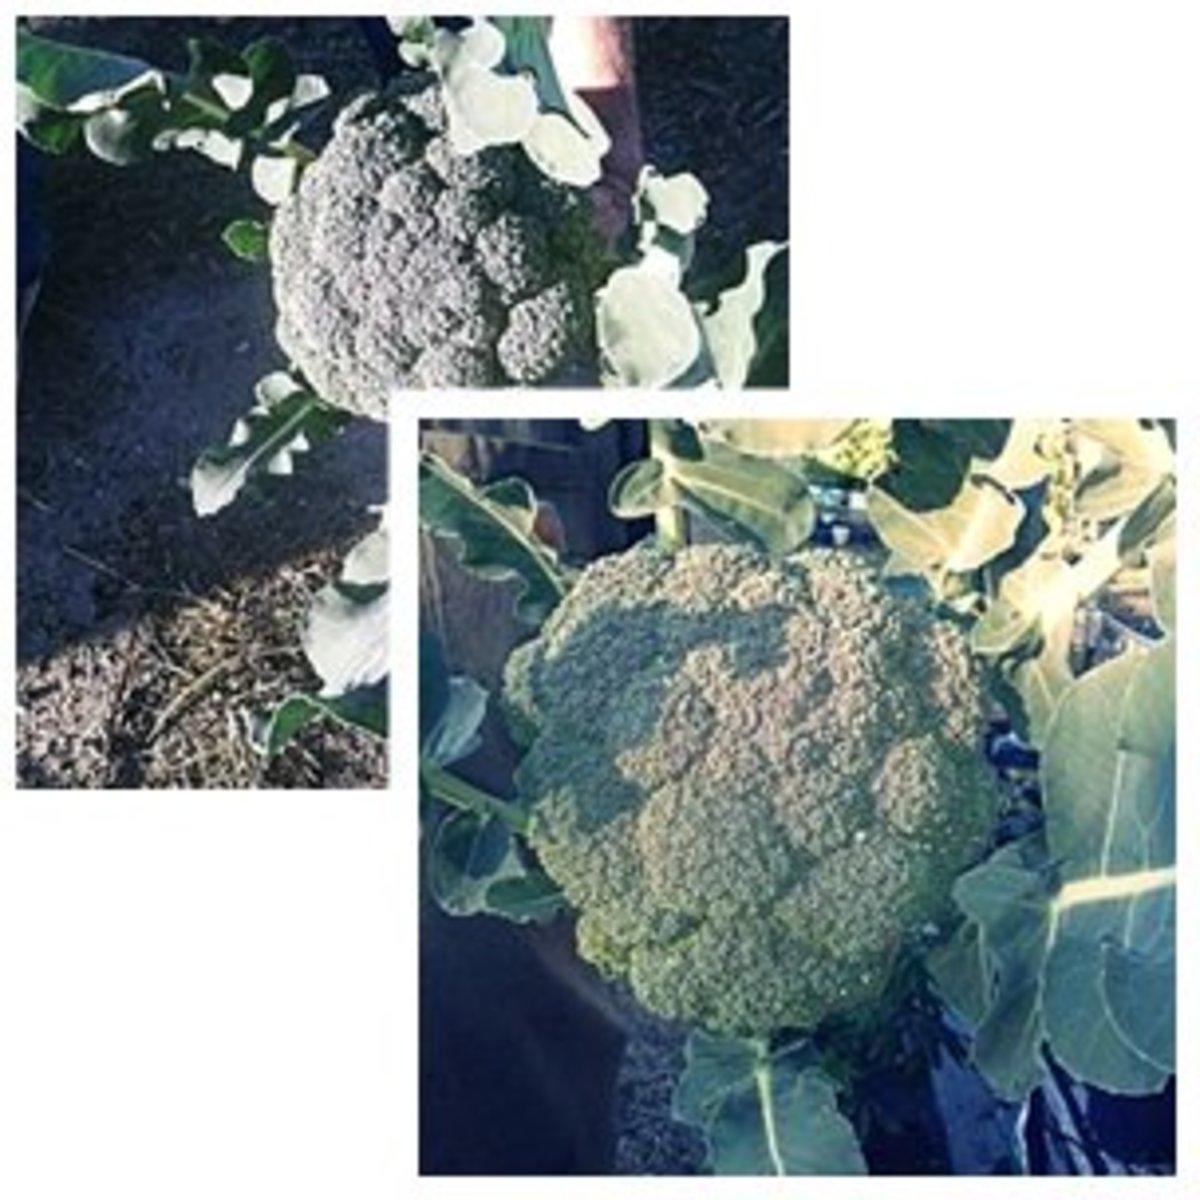 Fresh broccoli from Jerry's garden.